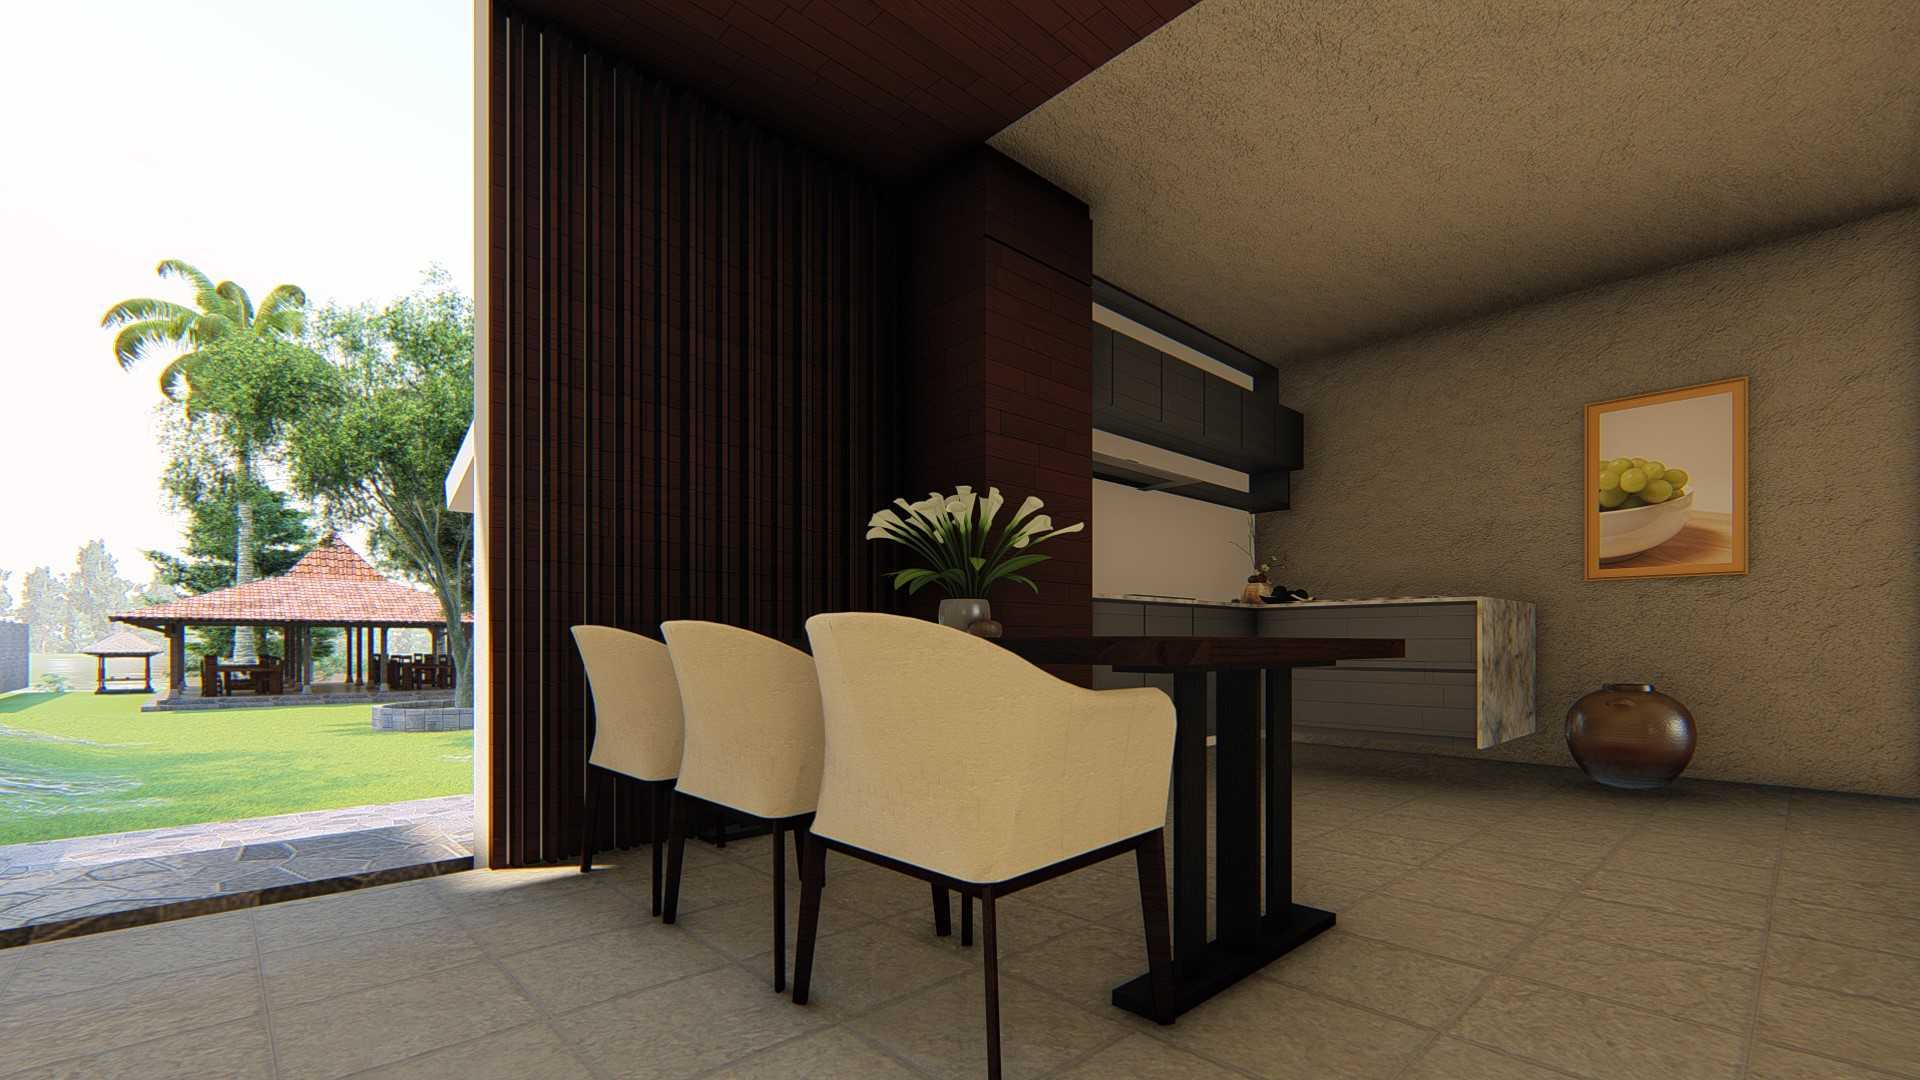 Raden Architect Rumah Wayang Cinwa Bogor, Jawa Barat, Indonesia Bogor, Jawa Barat, Indonesia Raden-Architect-Rumah-Wayang-Cinwa  79831